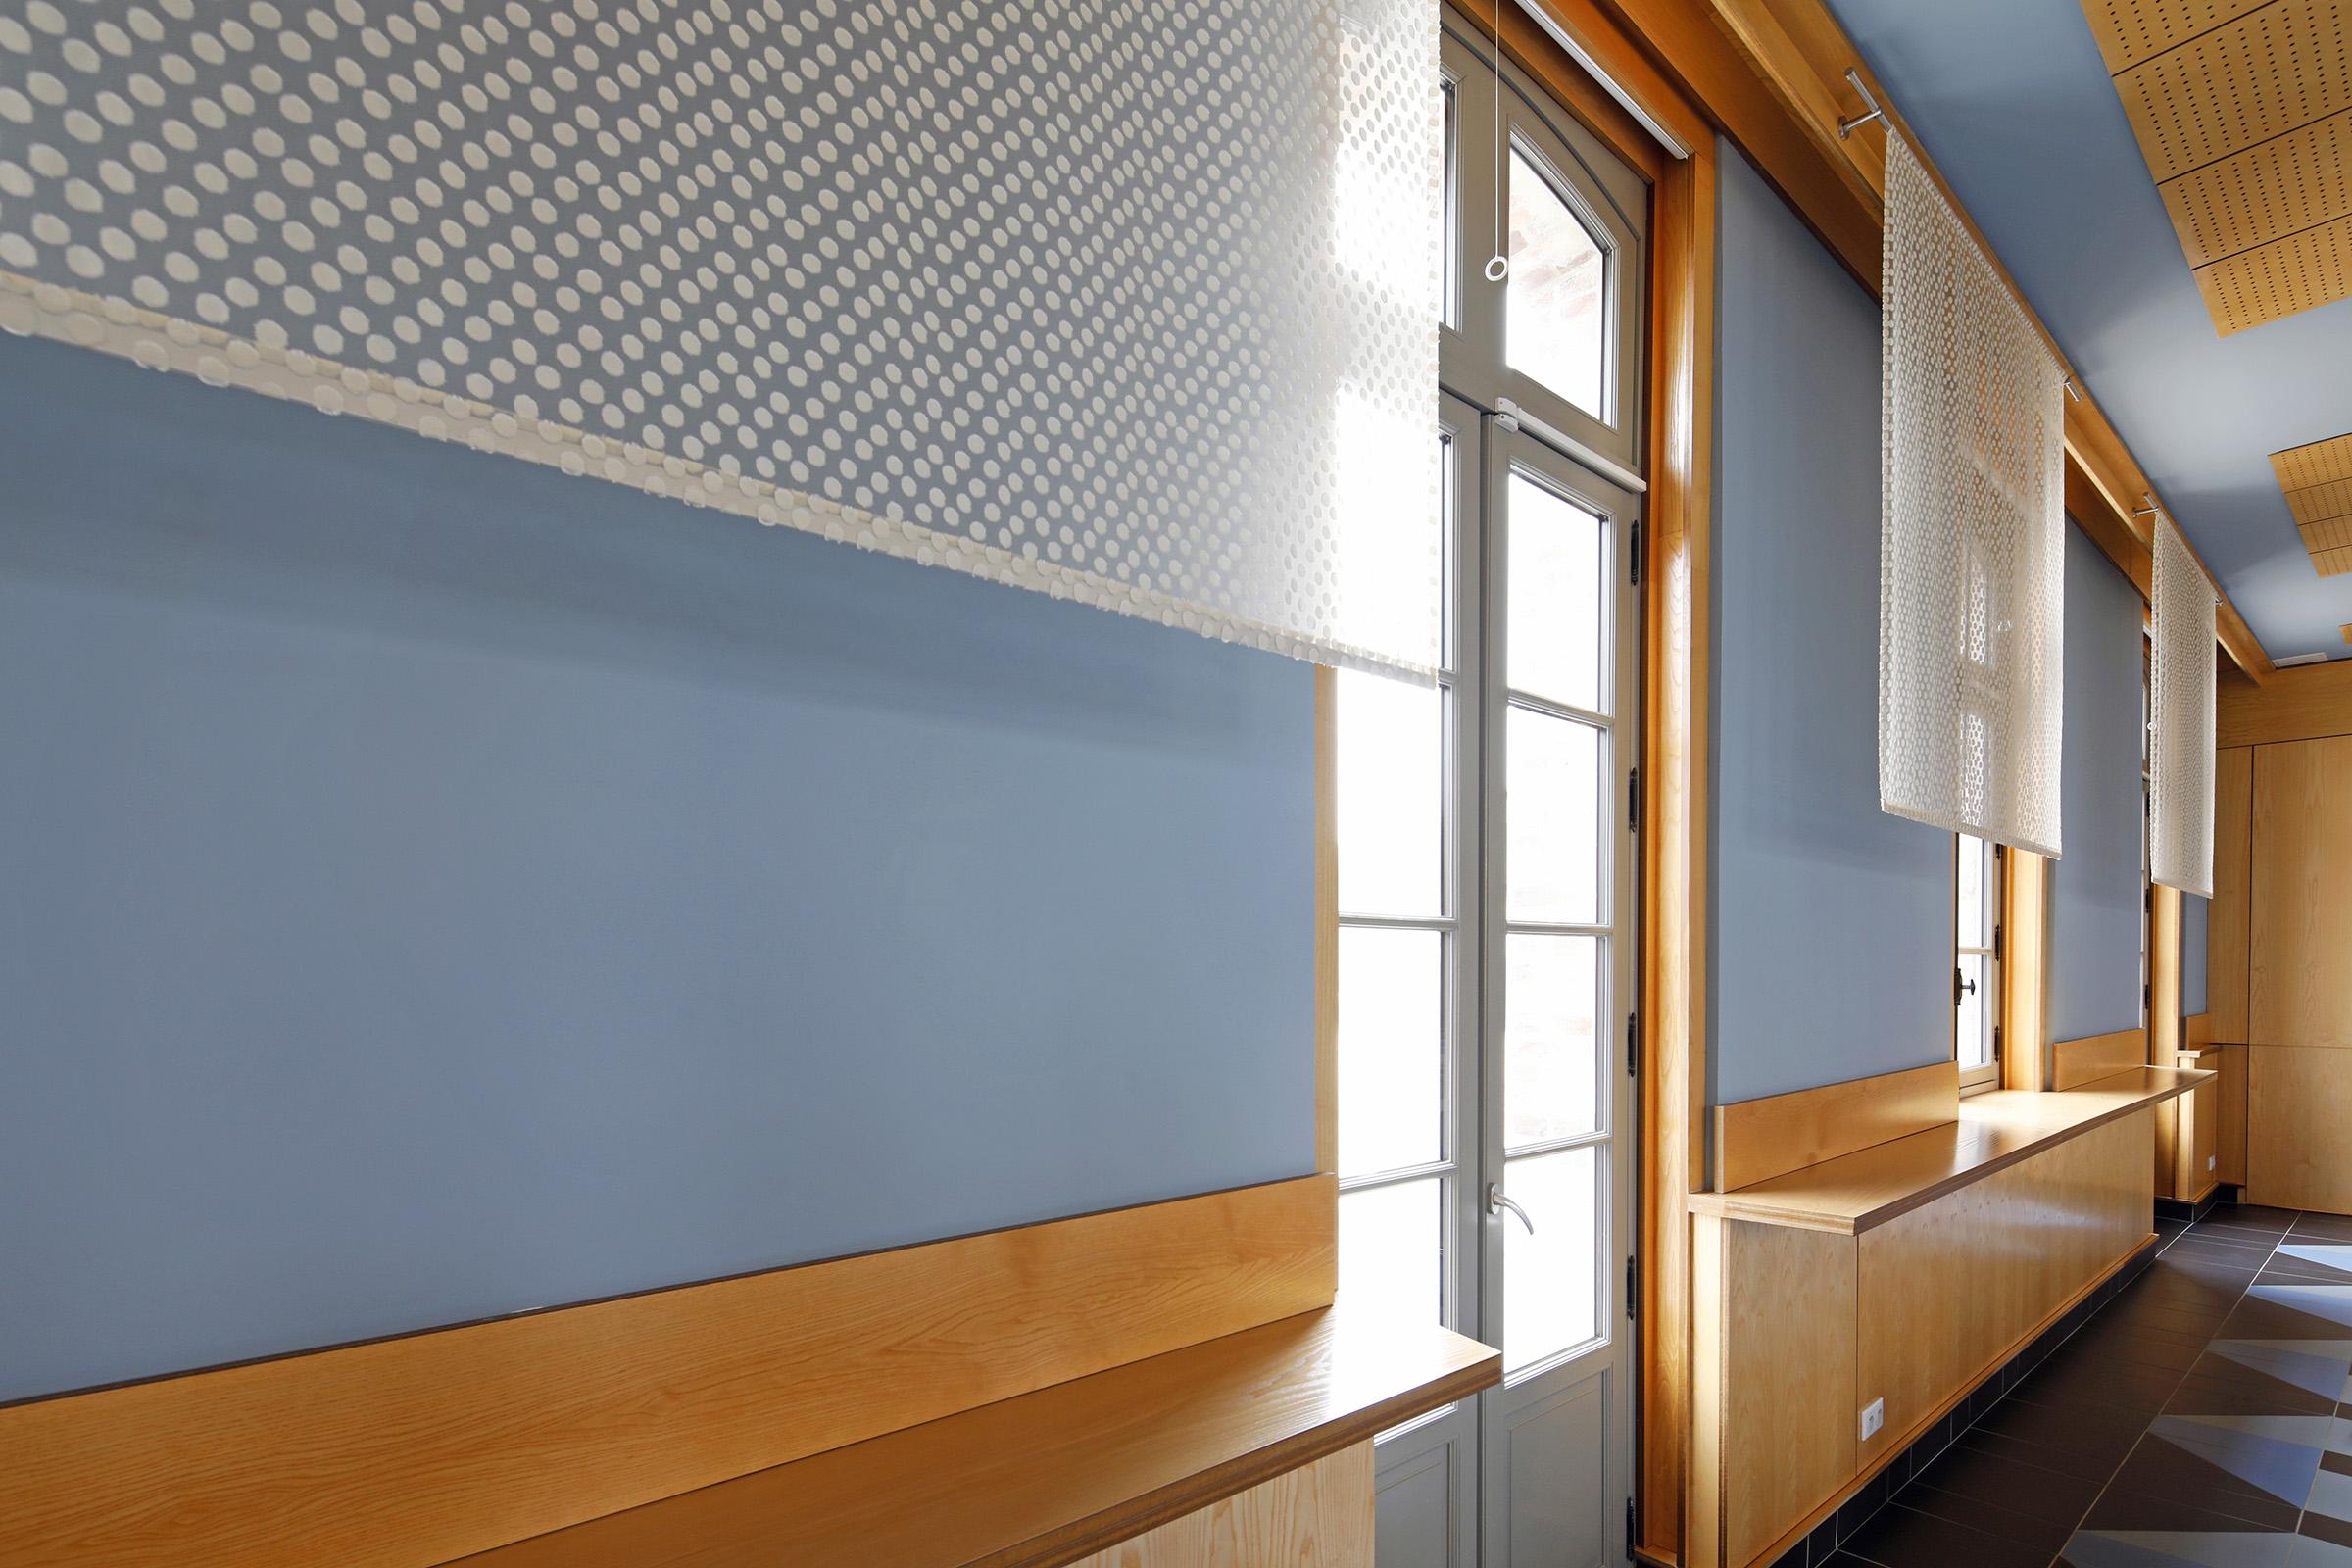 Amilly - La Maison Saint Loup - Interieur - Sylvain Dubuisson 029.jpg